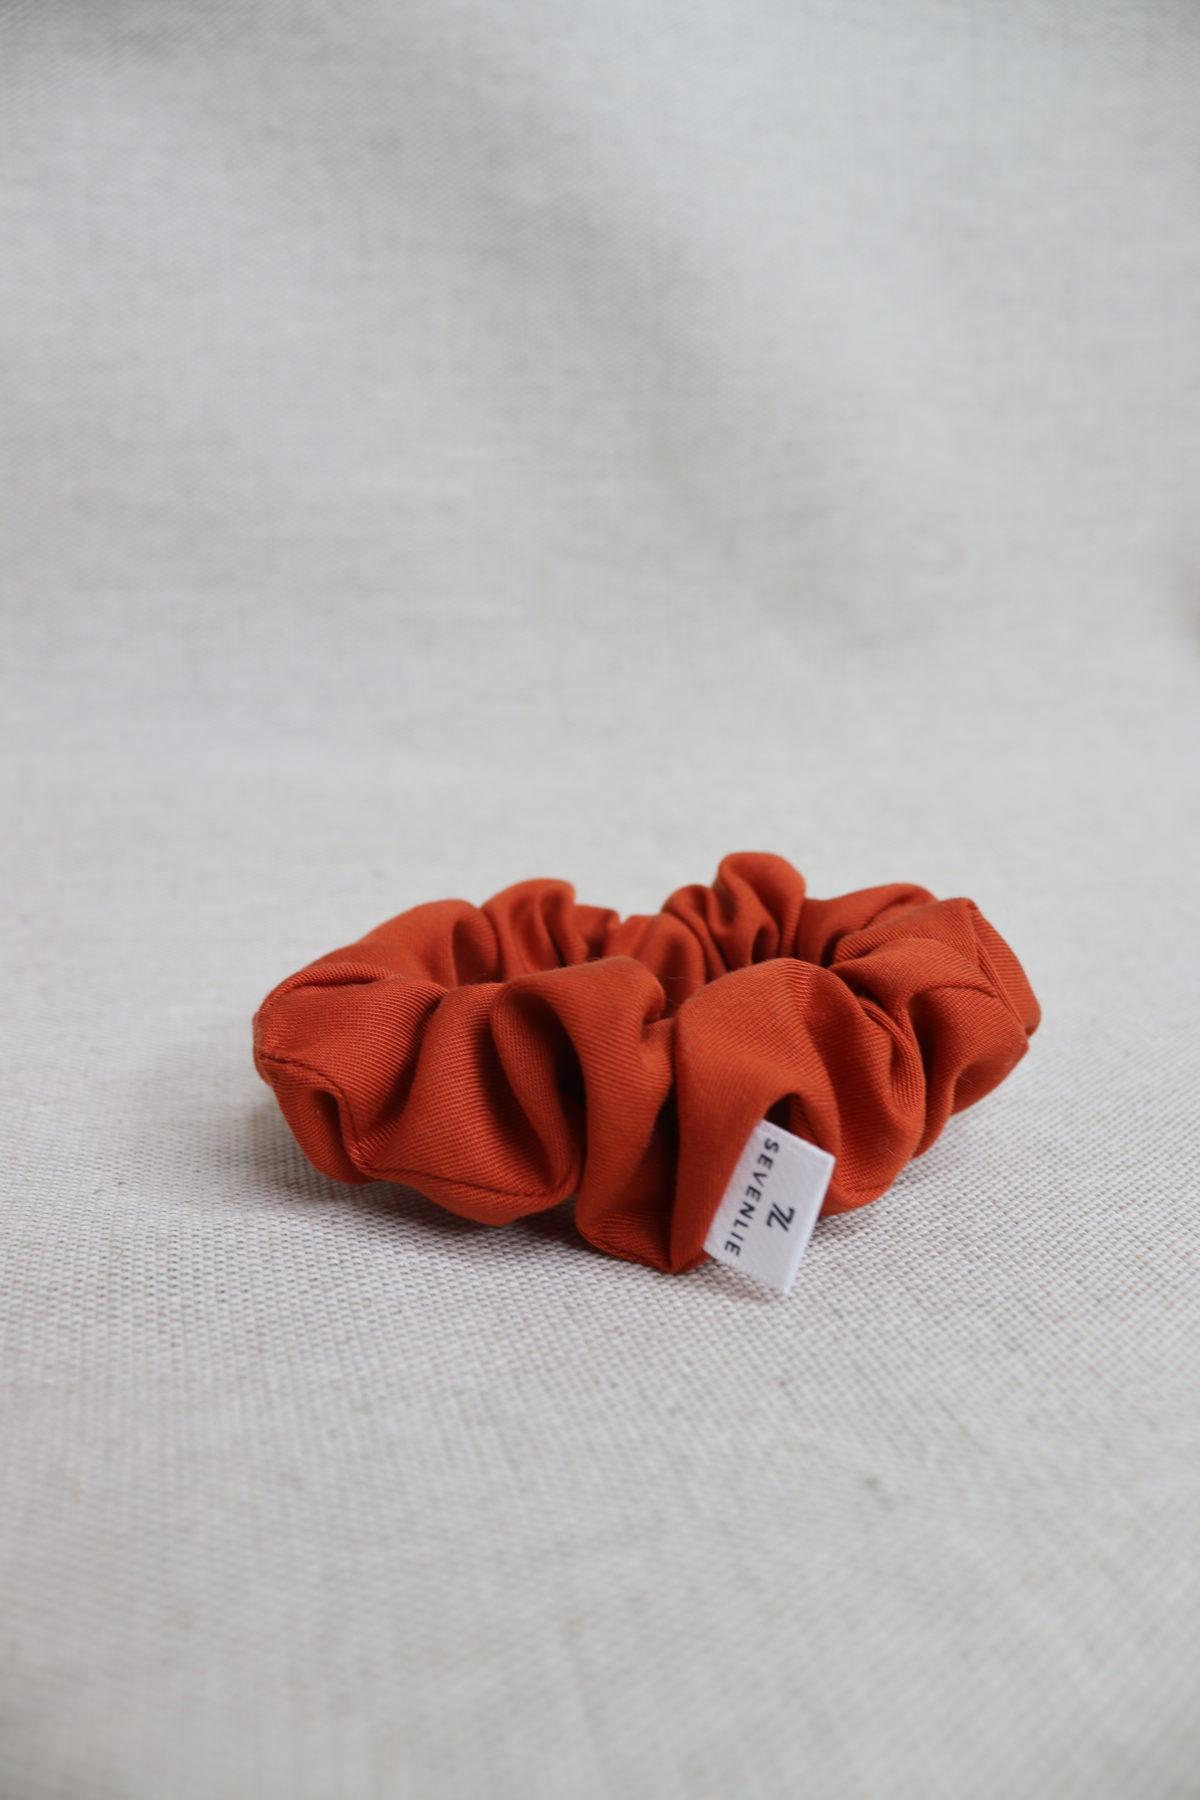 Chouchou tencel - Terracotta - Sevenlie